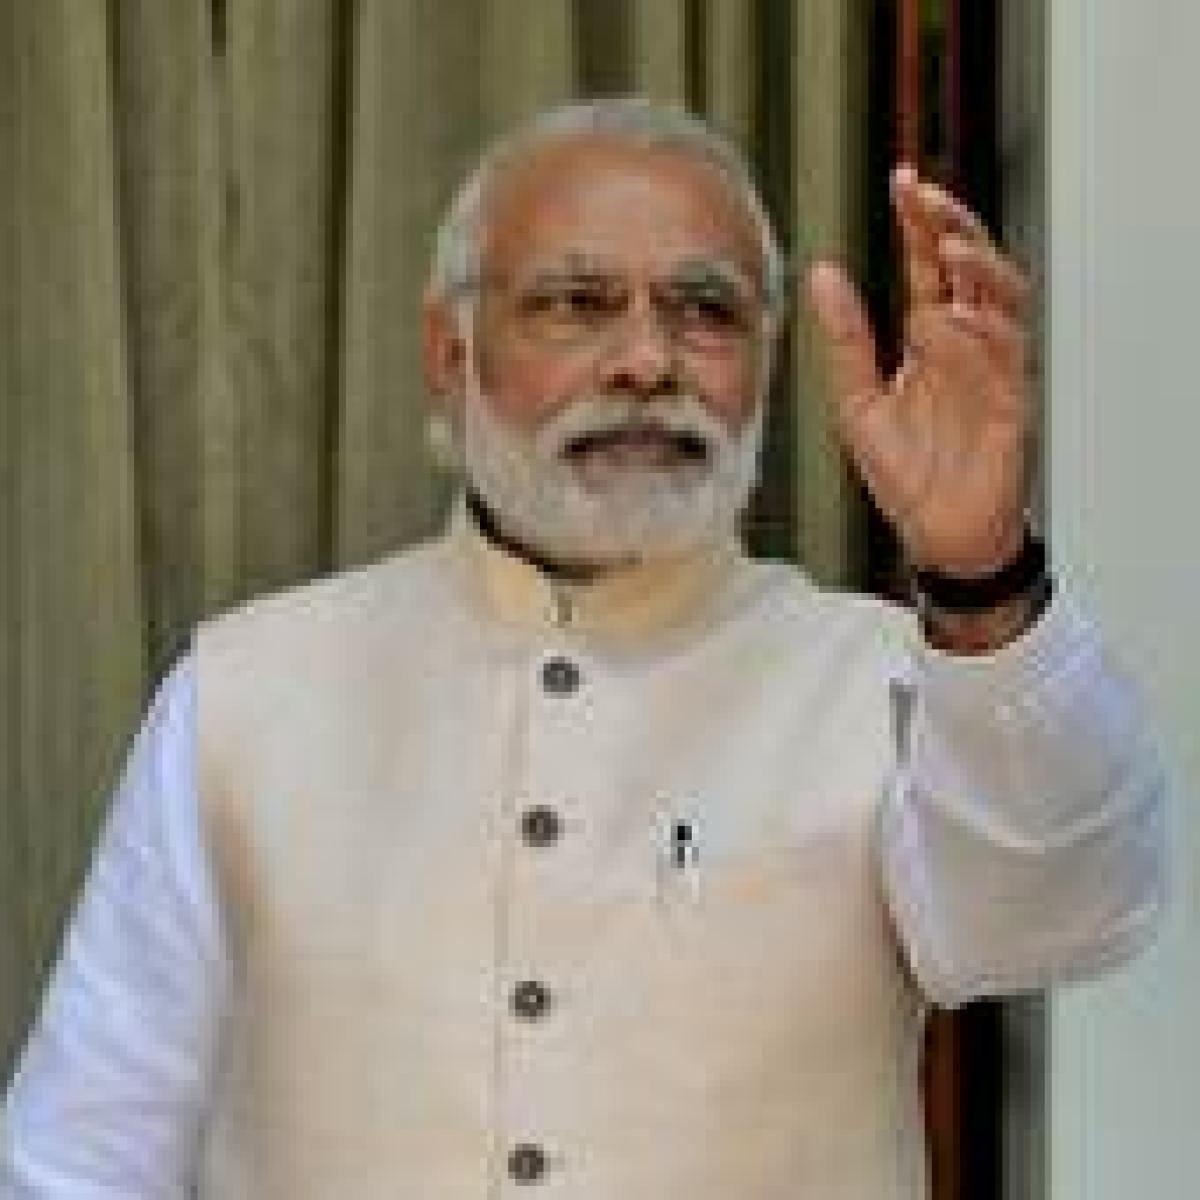 Modi meets 'friend' Jaitley's family on return home